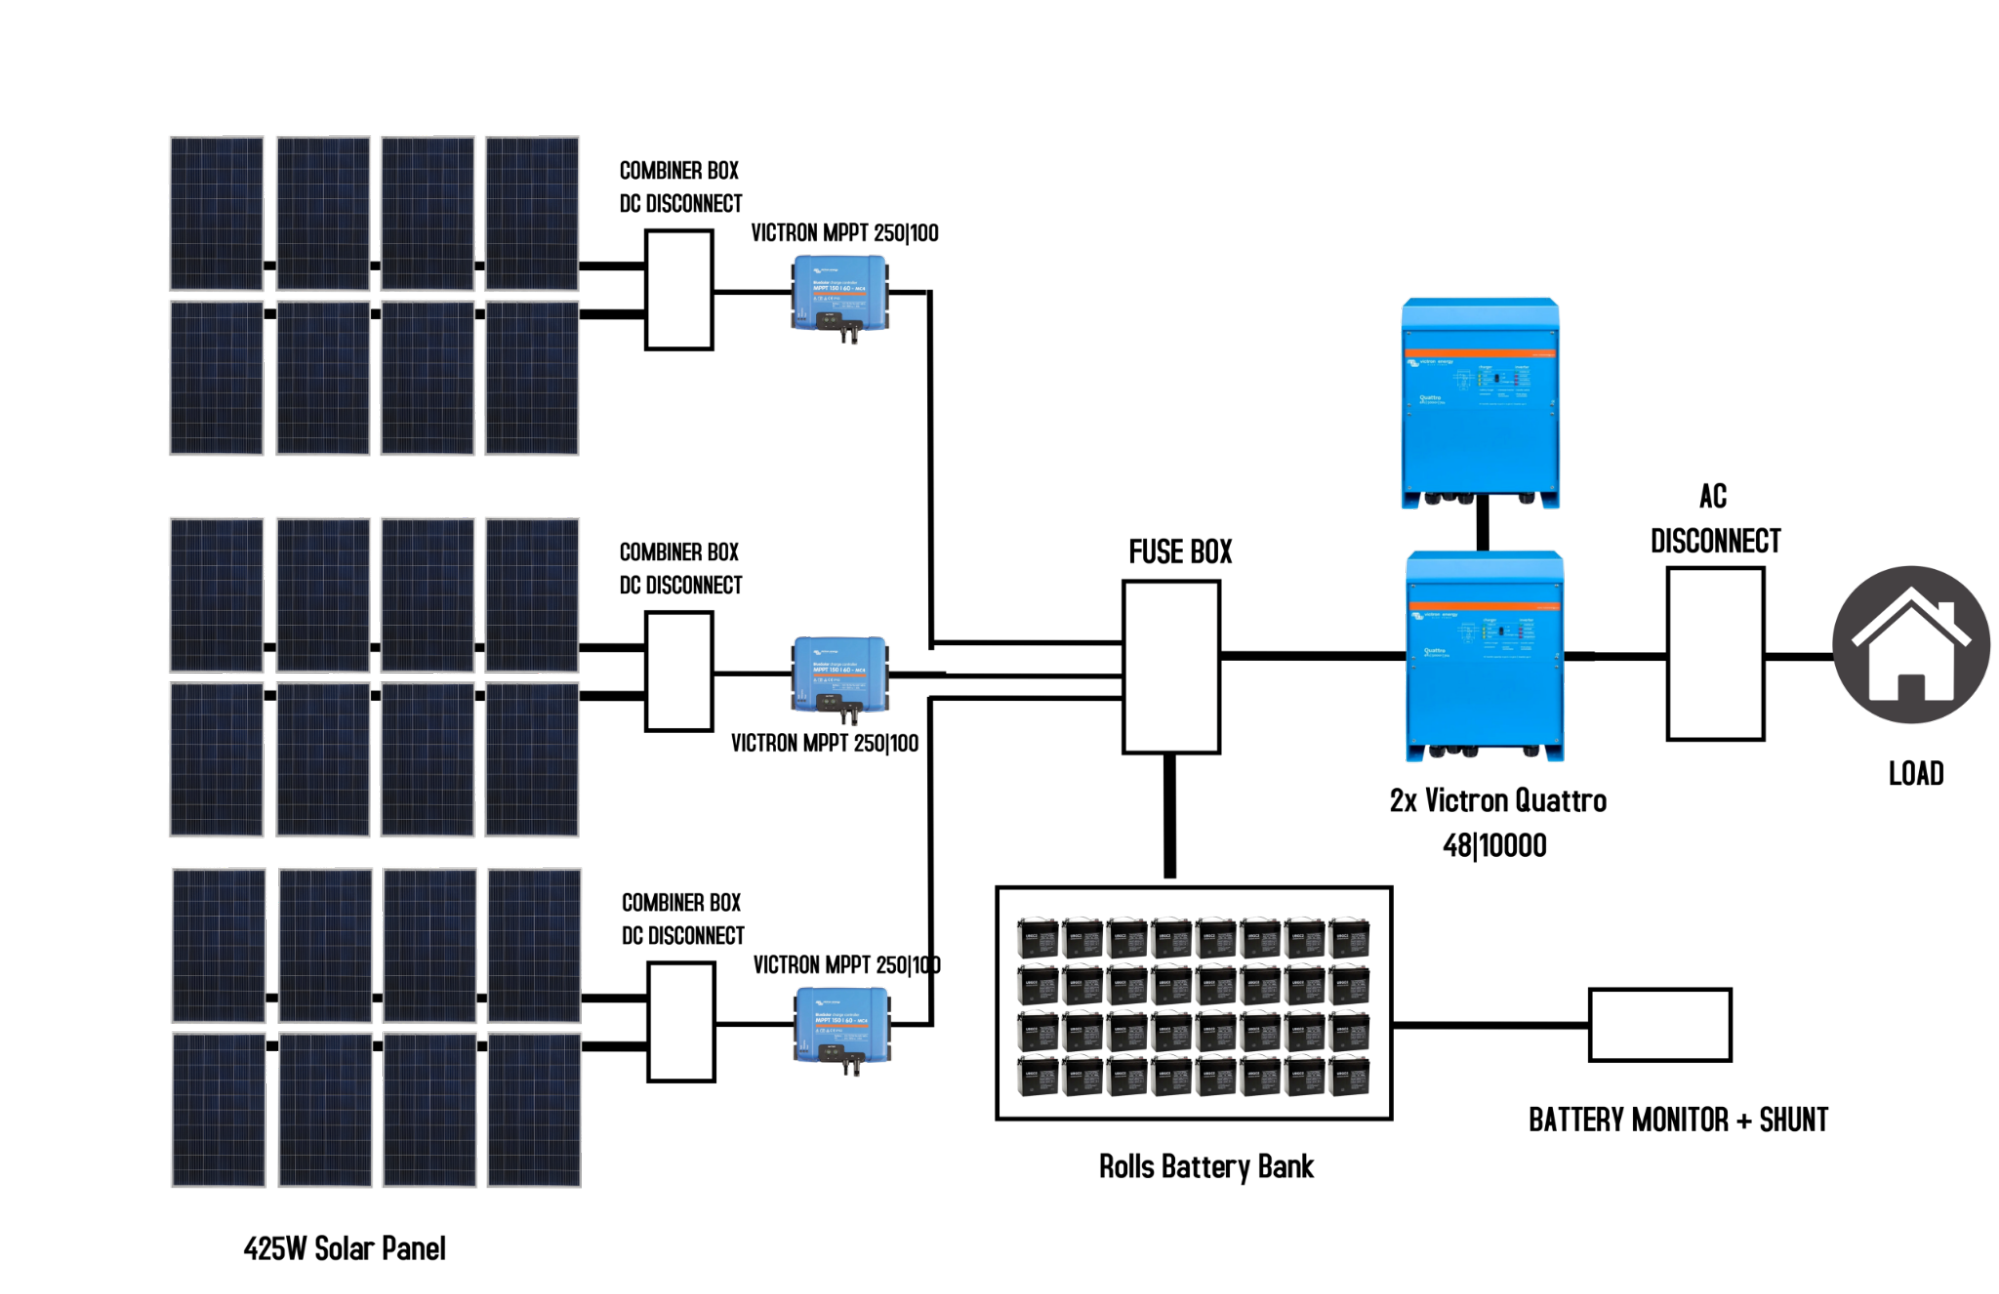 Off-grid 8.0 technical details